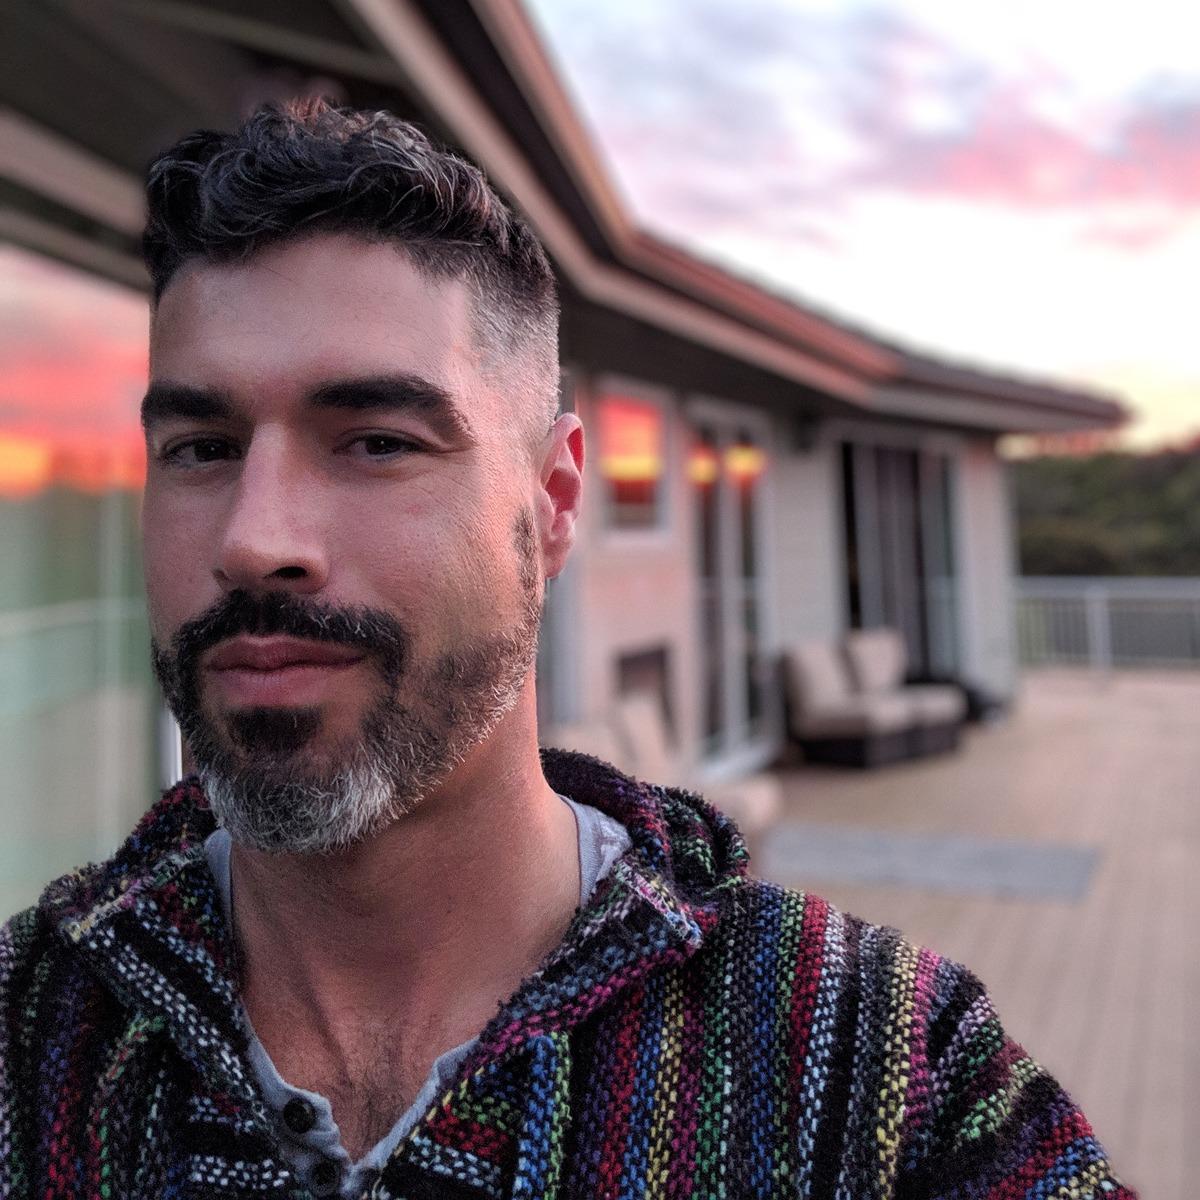 #PrideMonth Activist Spotlight: Christopher Robinson